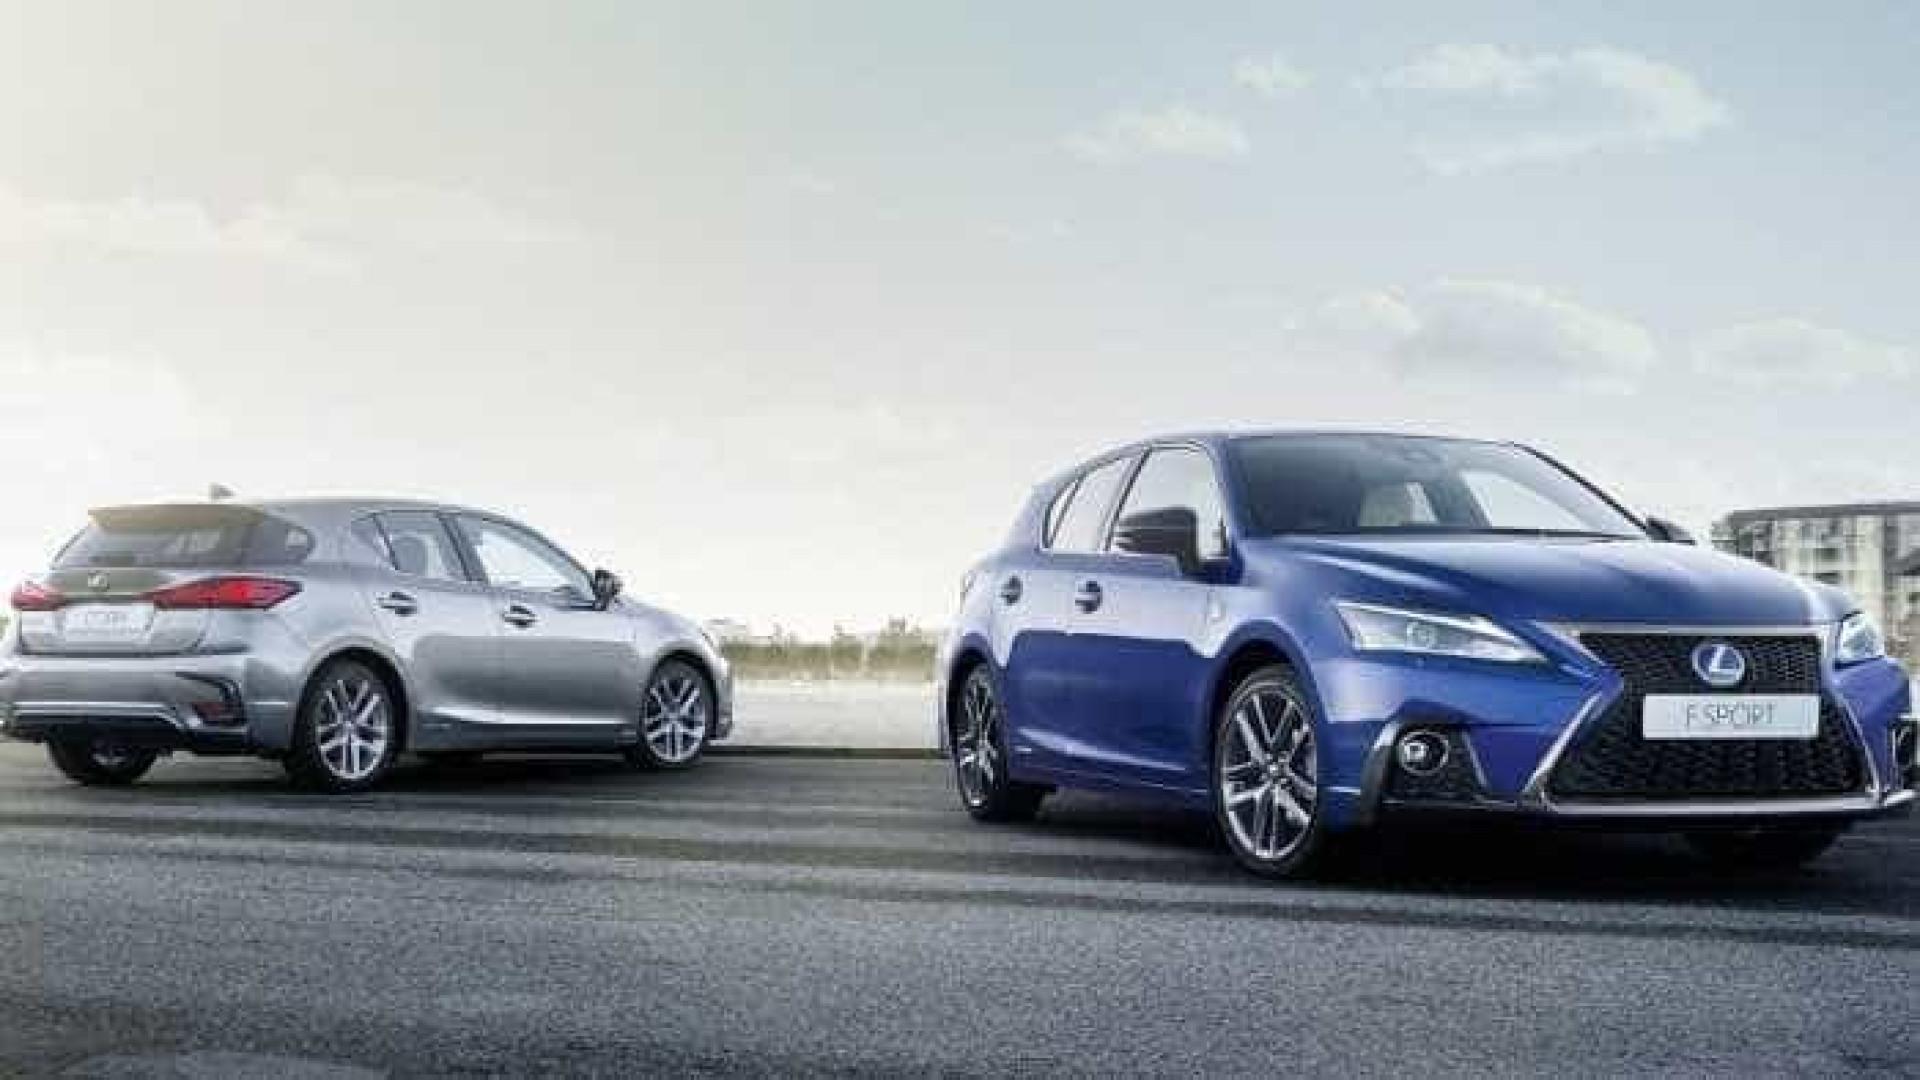 Lexus desafia consumidores a trocar carro a diesel por um híbrido